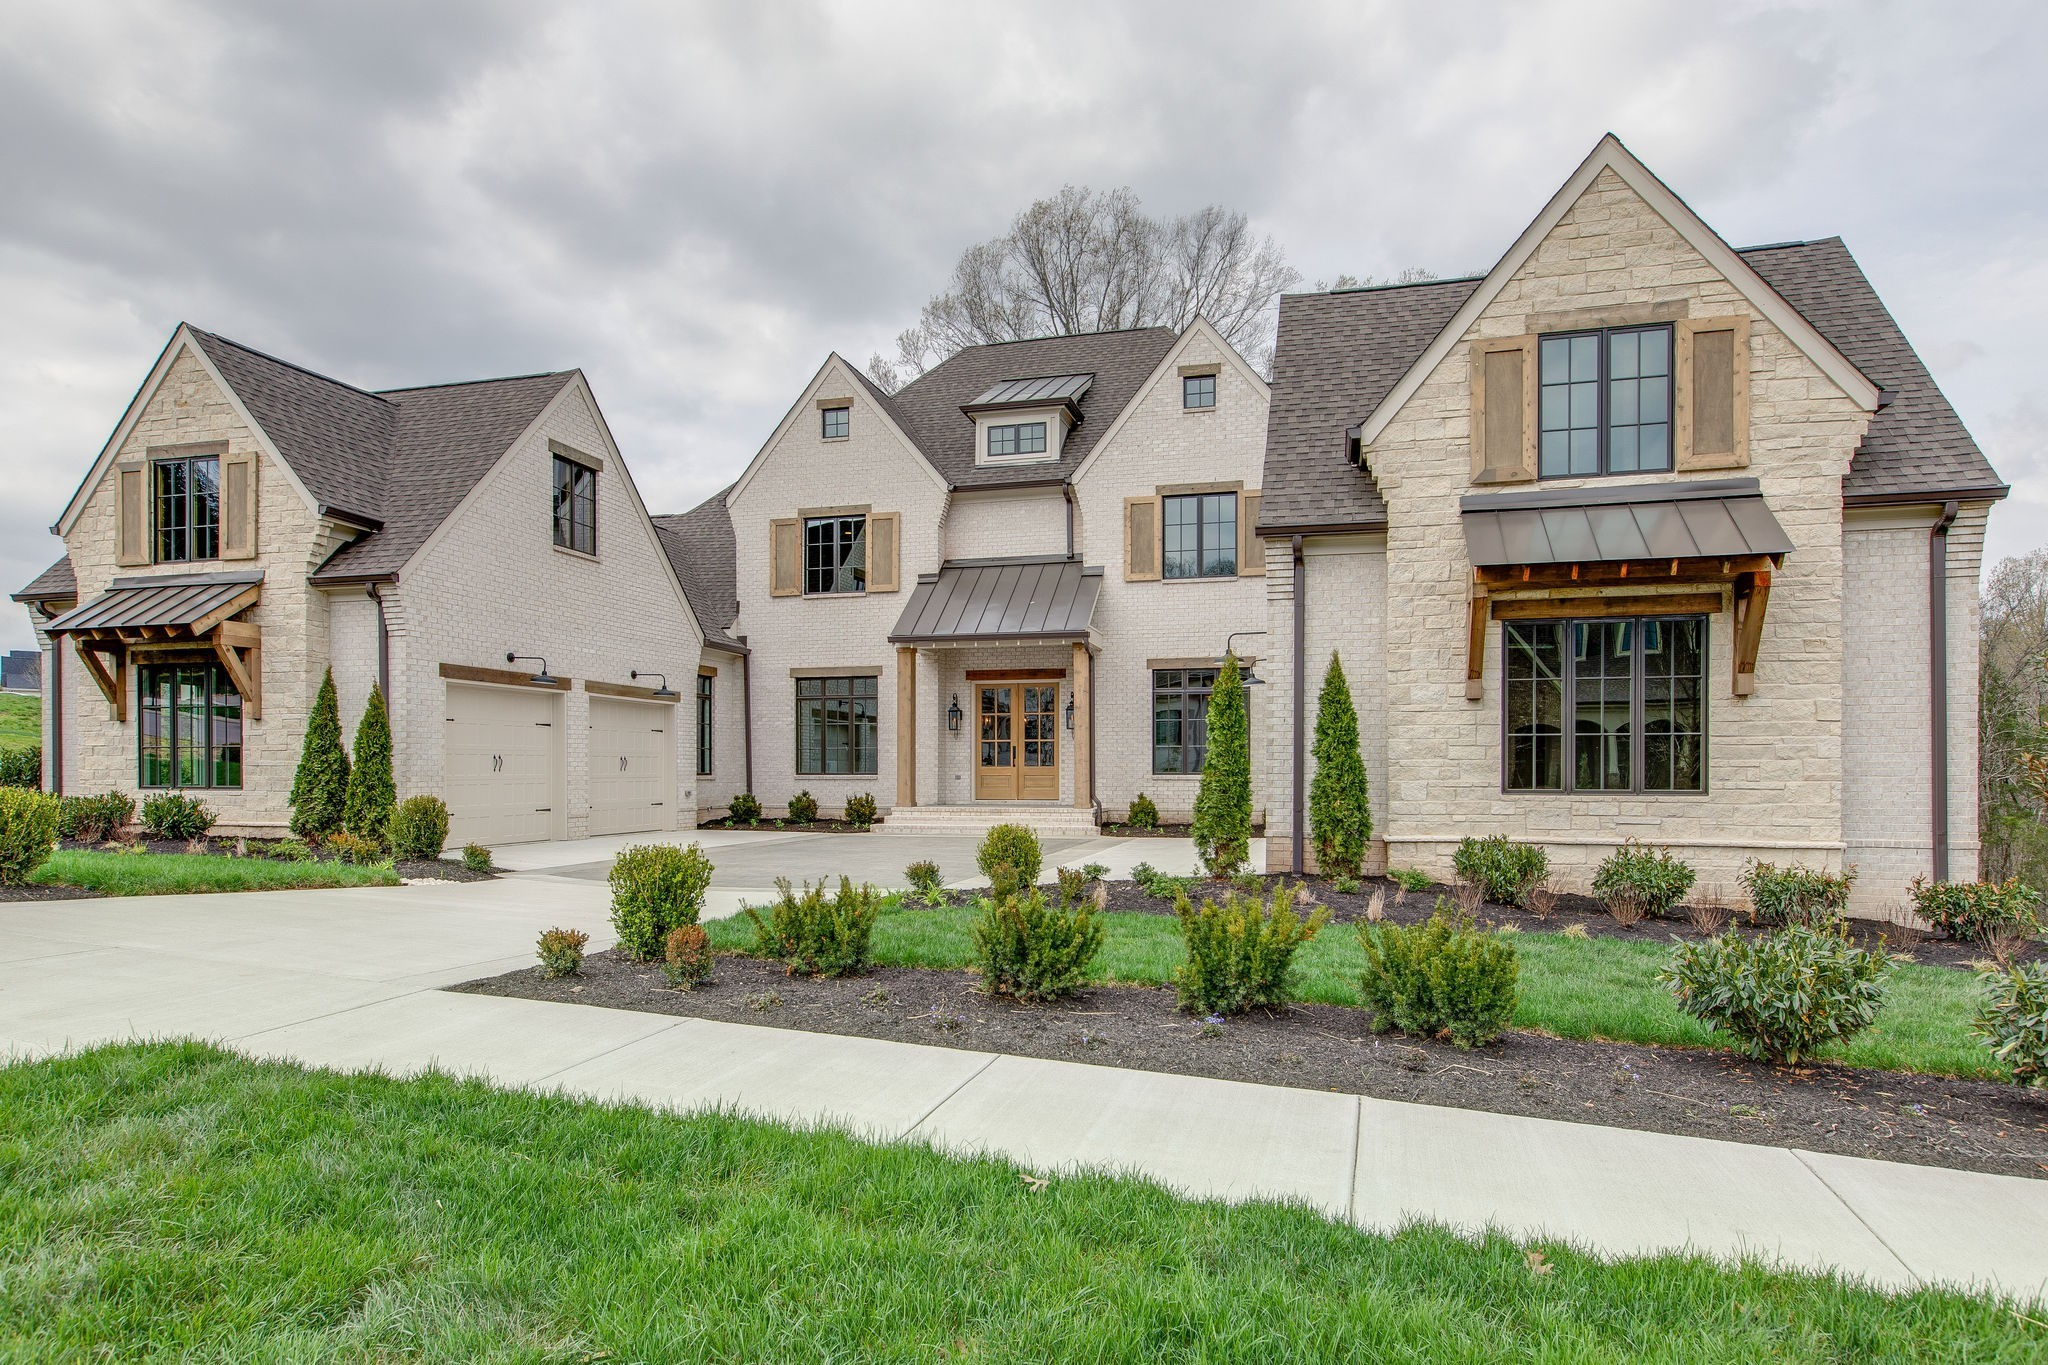 8614 Belladonna Dr (Lot 7047) Property Photo - College Grove, TN real estate listing